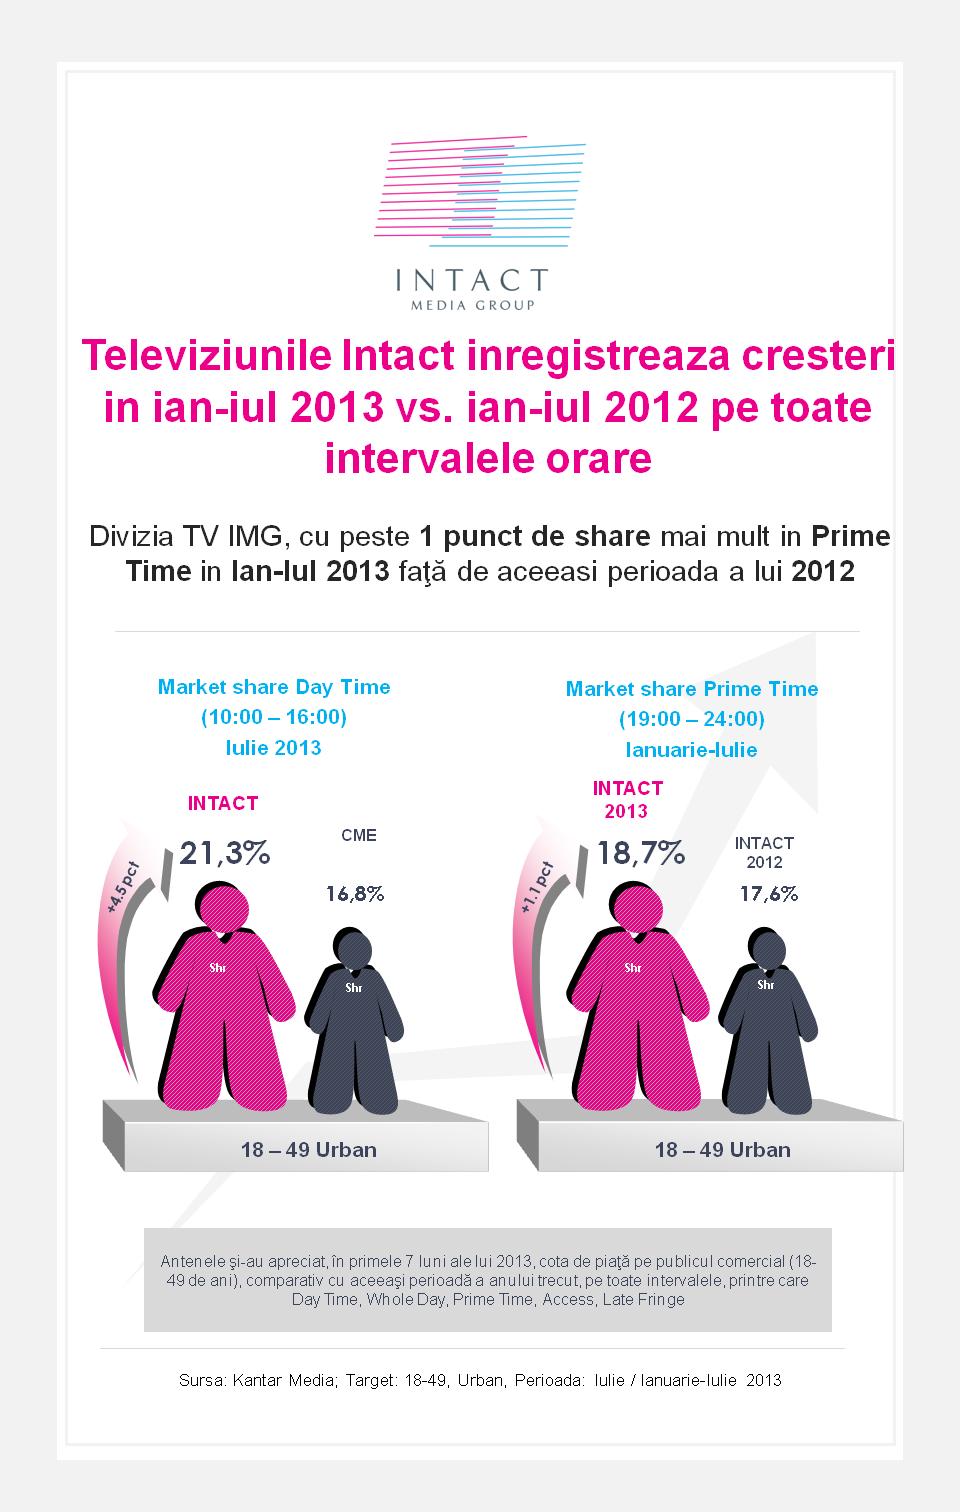 televiziunile-intact-inregistreaza-cresteri-in-ian-iulie-2013vs-ian-iulie-2012